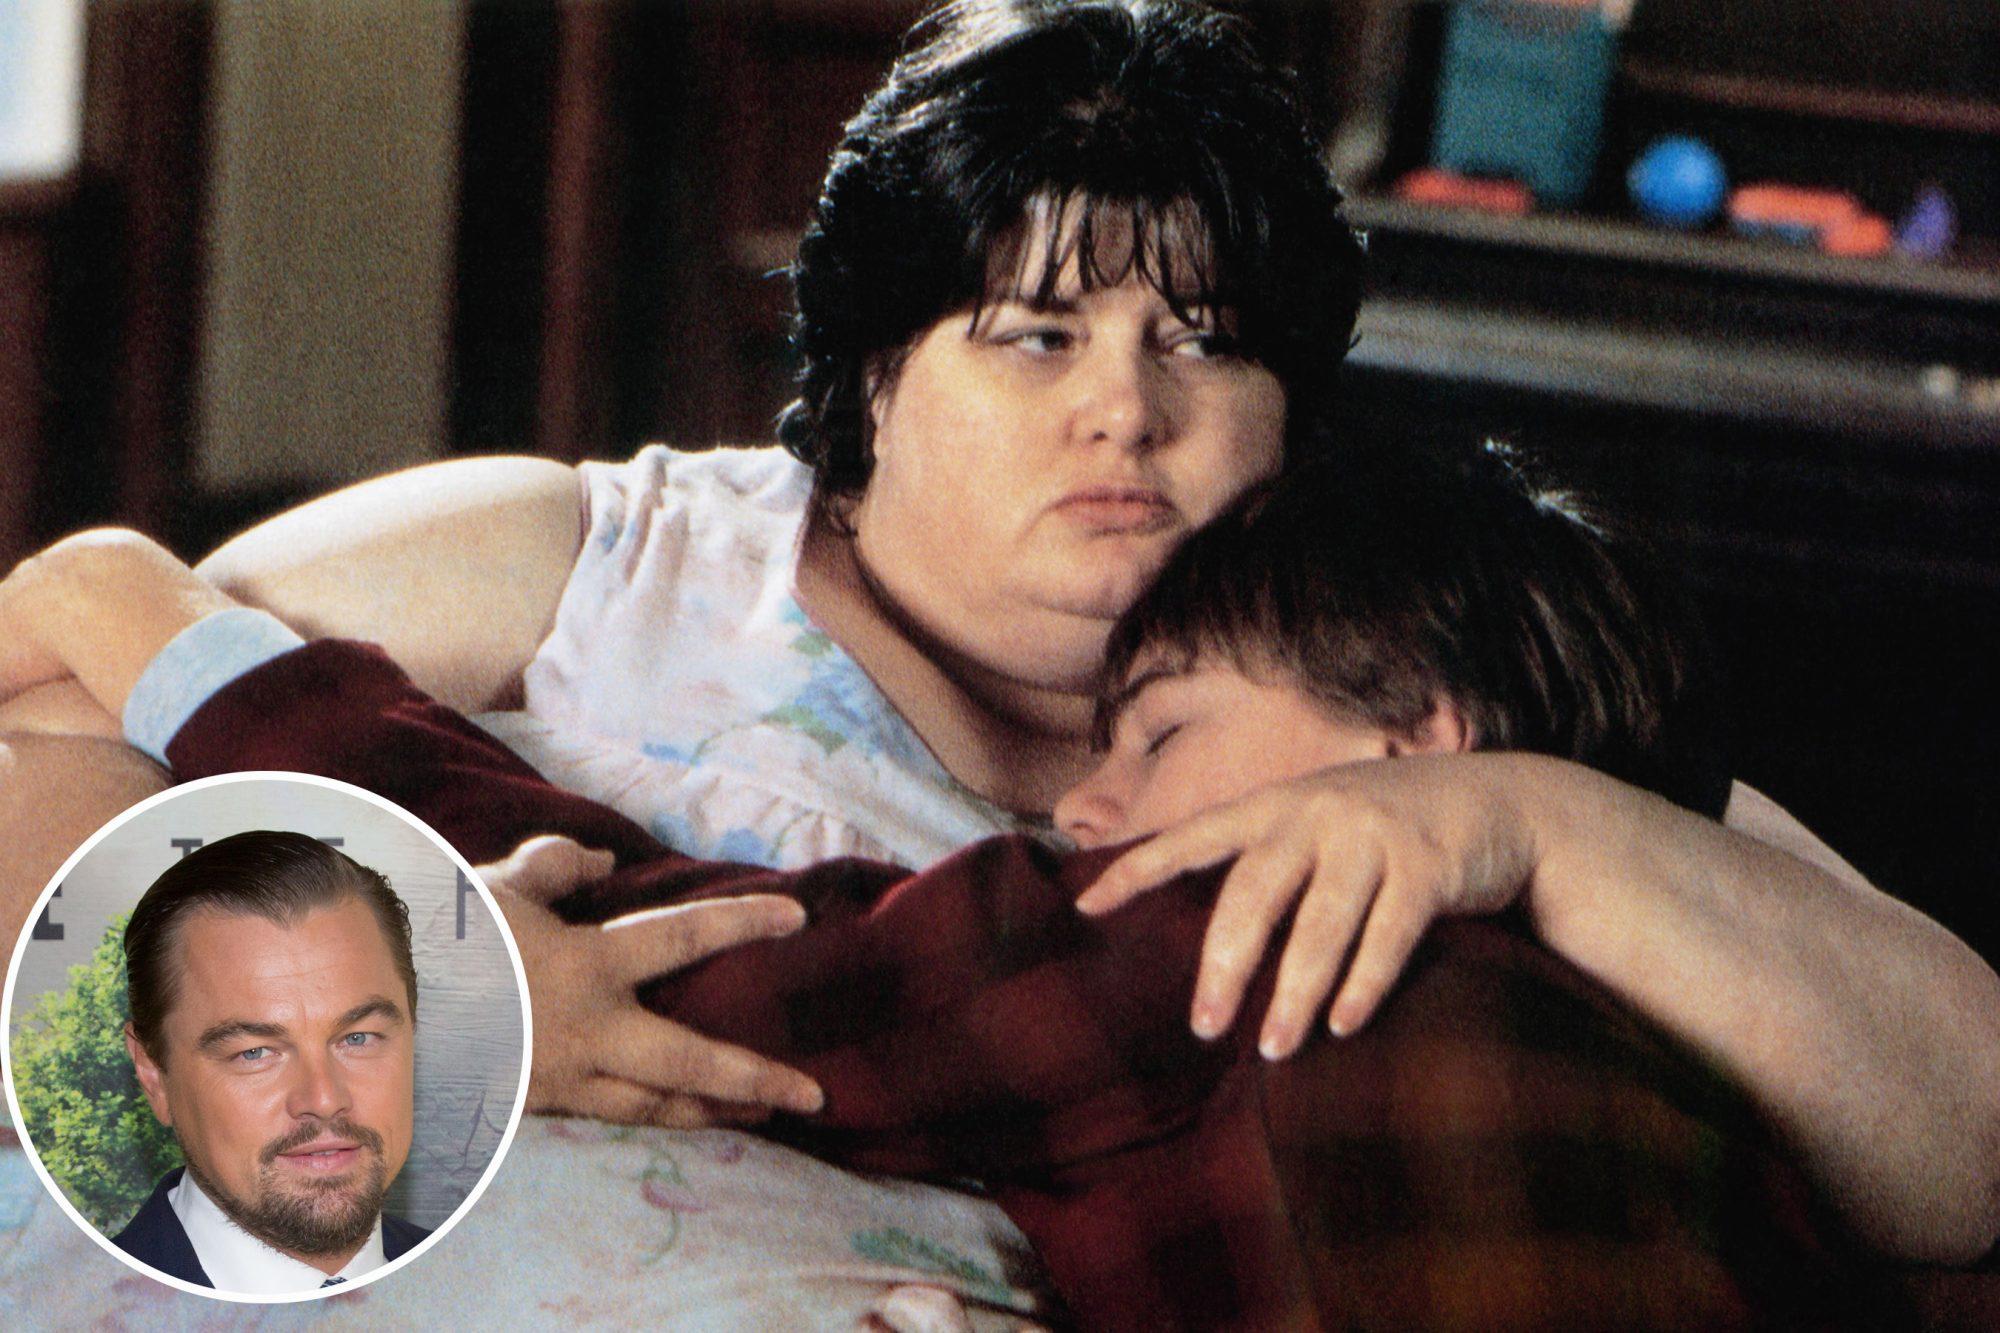 WHAT'S EATING GILBERT GRAPE, from left: Darlene Cates, Leonardo DiCaprio, 1993, © Paramount/courtesy